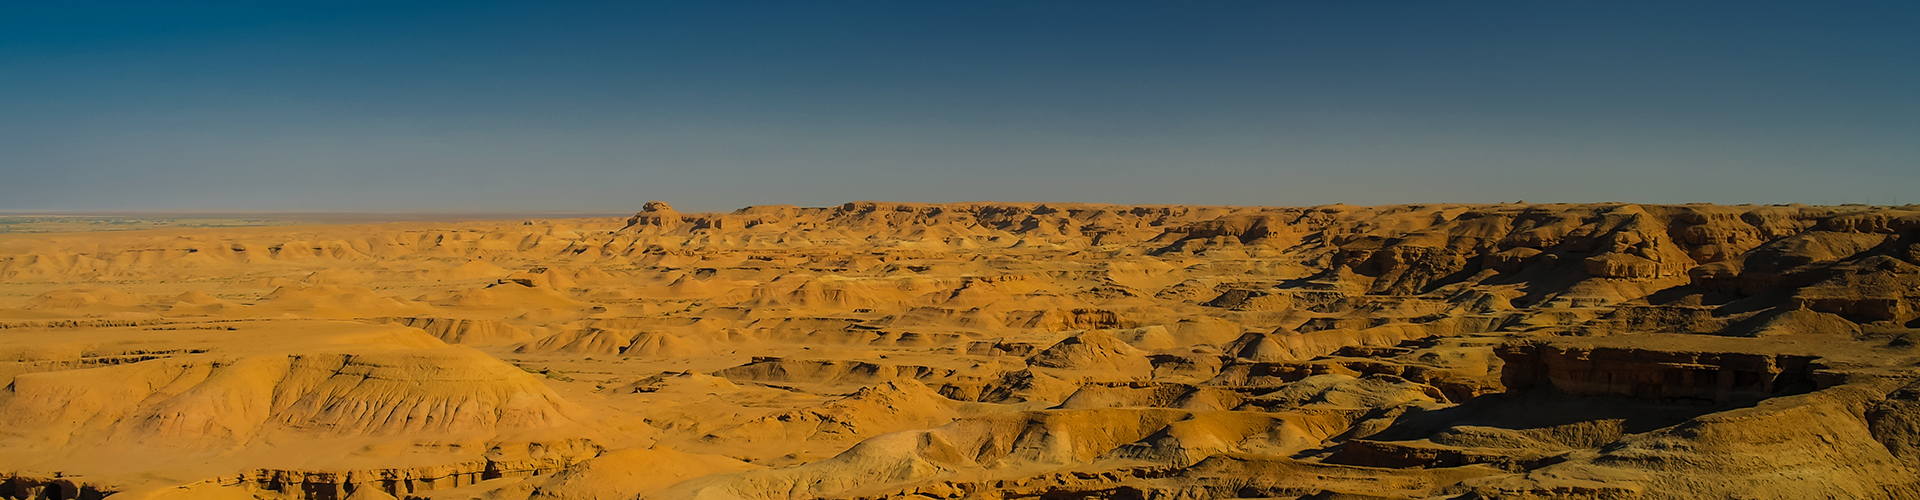 Landmark photograph of Iraq